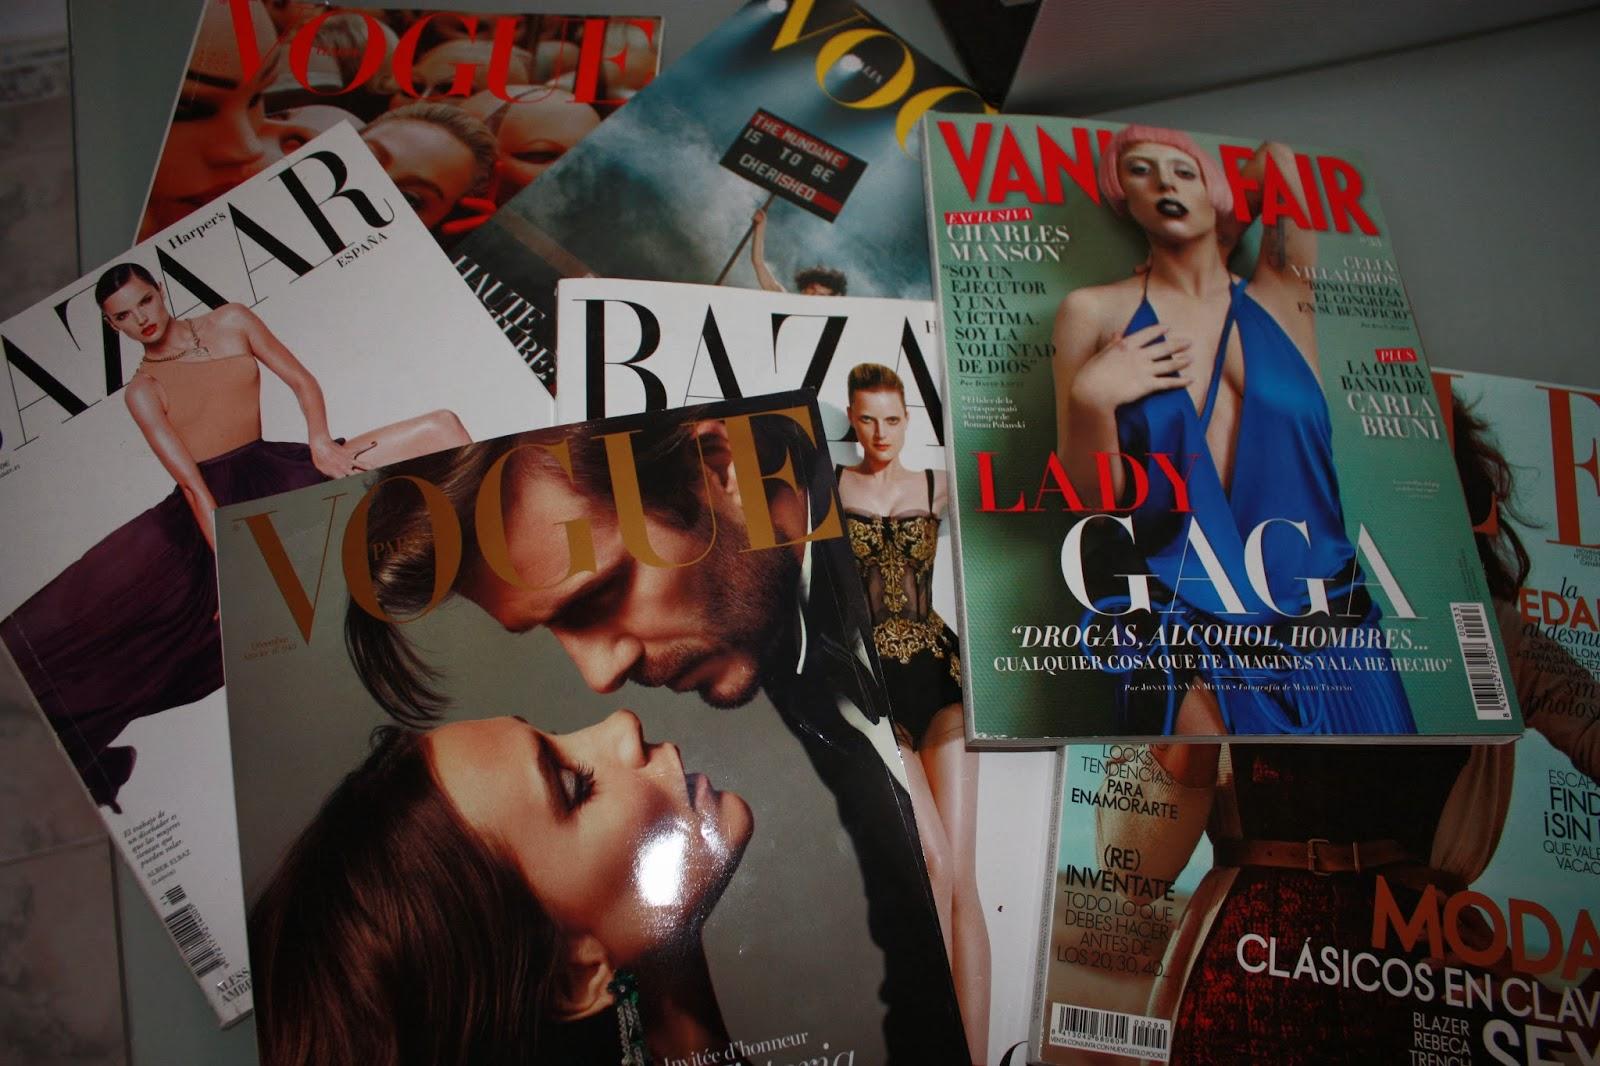 La Moda de mi vida La historia de una escritora fashionista